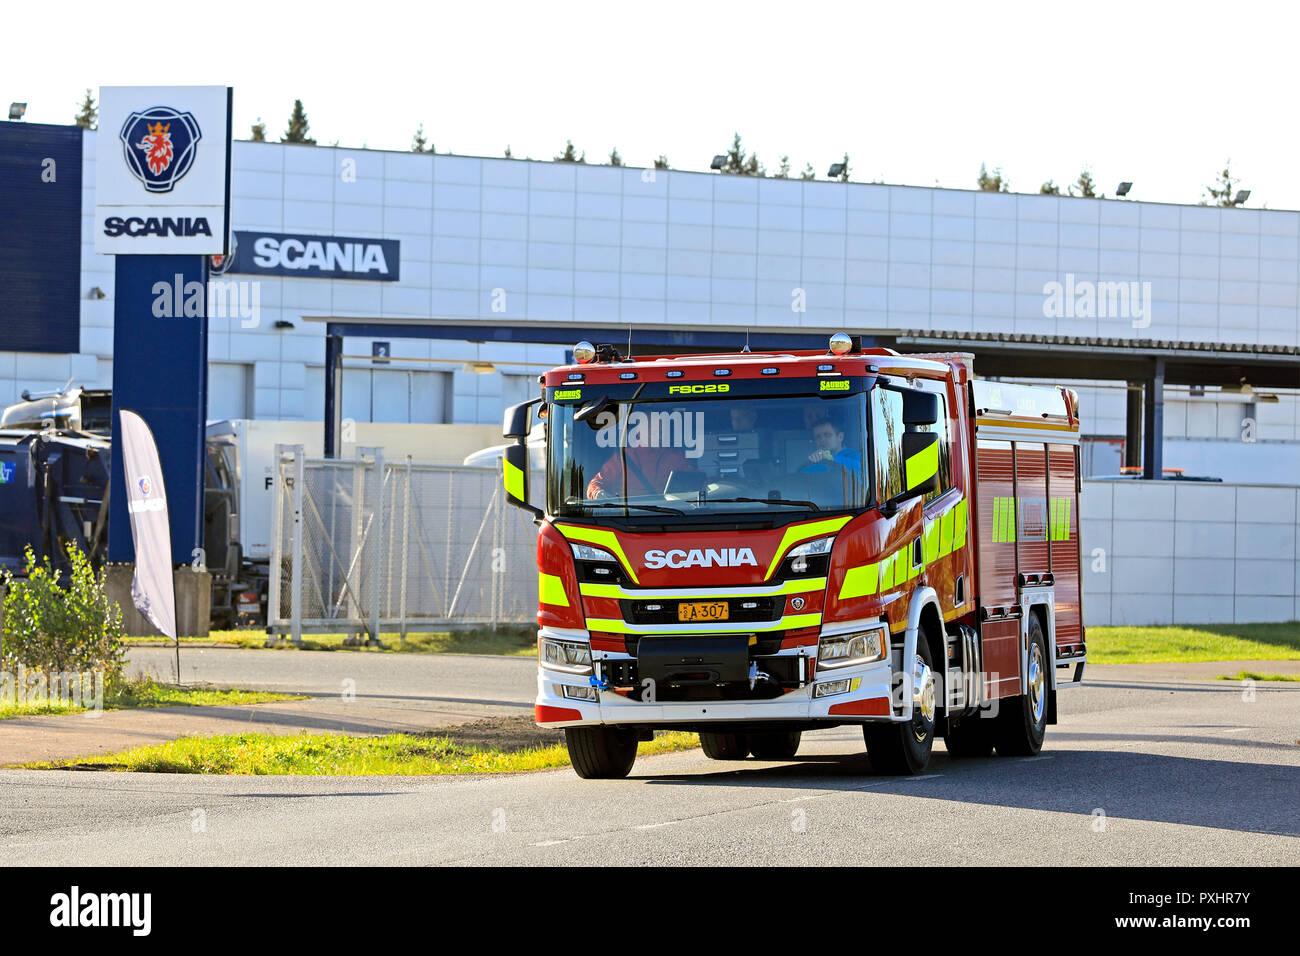 Scania Feuerwehrauto Stockfotos Amp Scania Feuerwehrauto